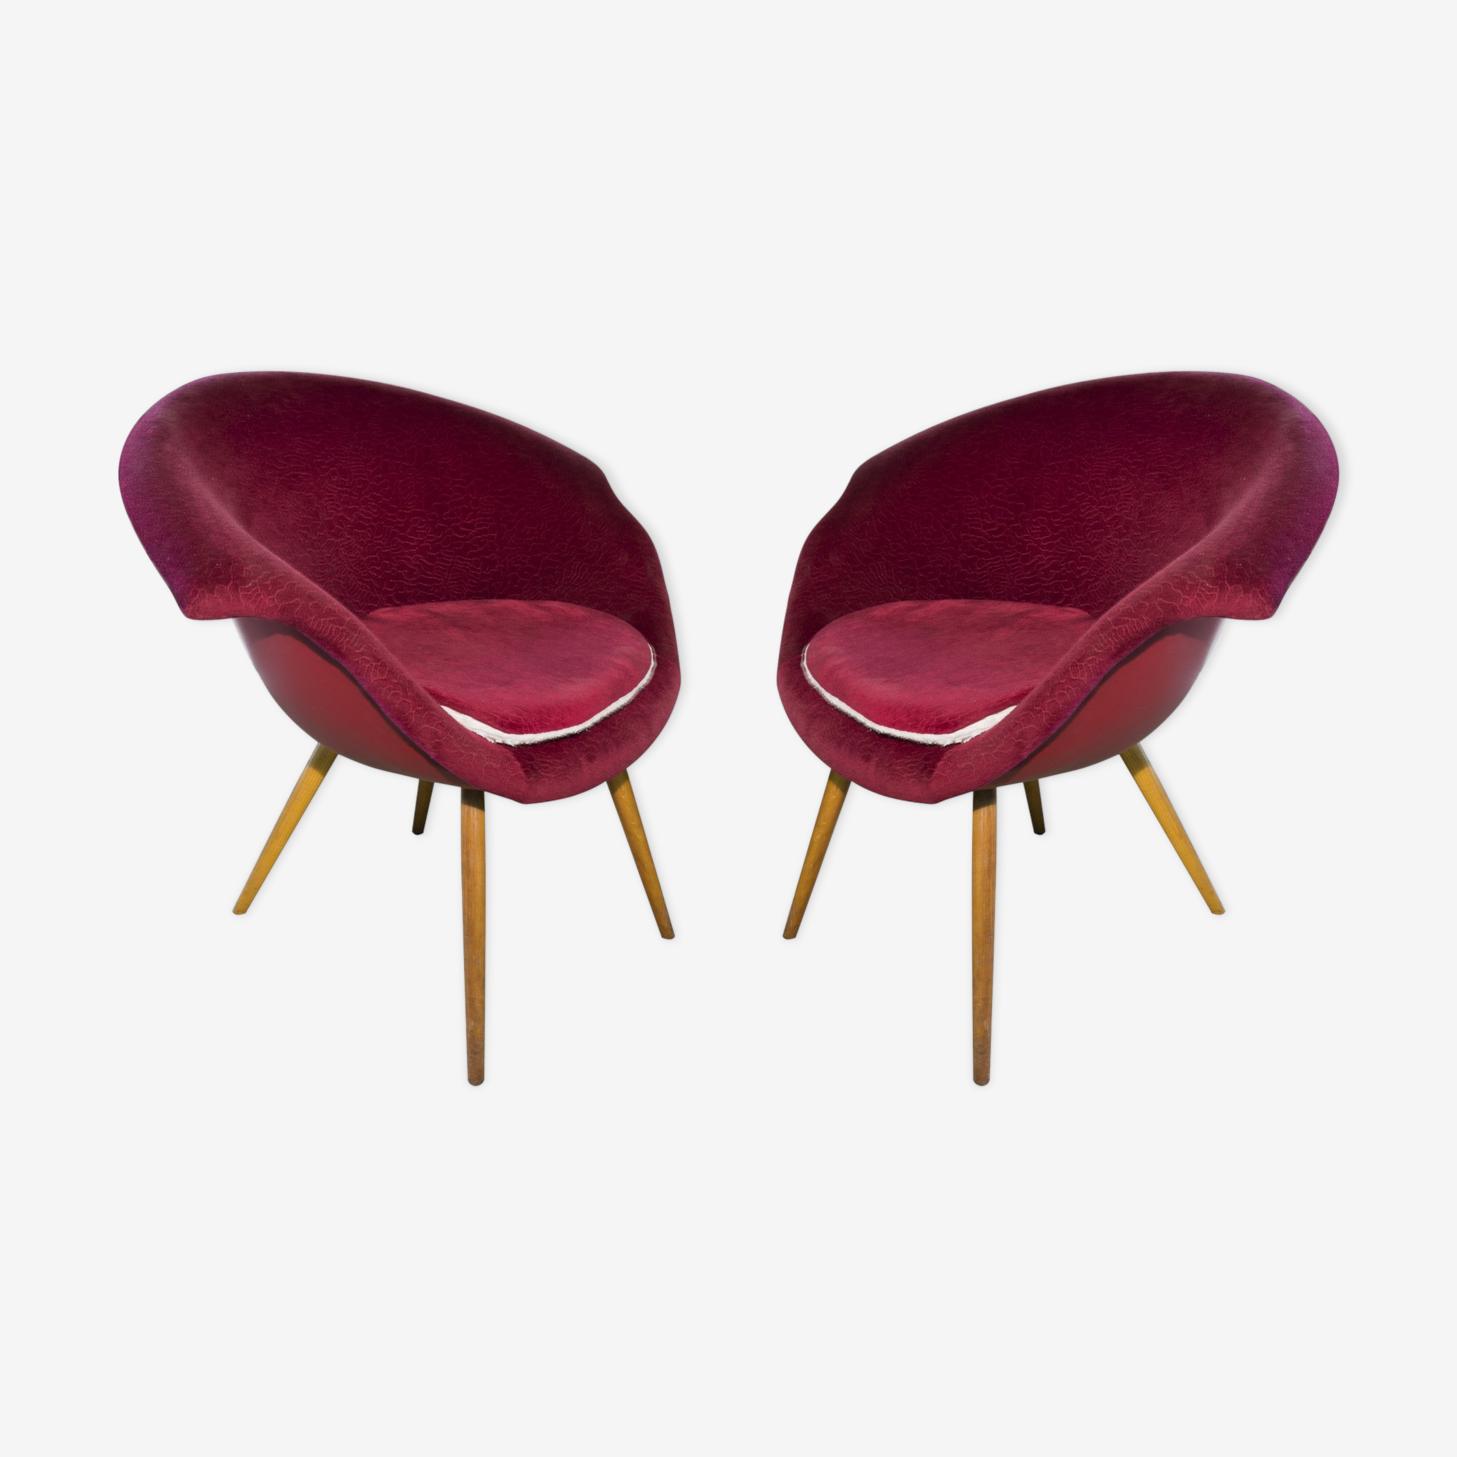 Paire de fauteuils Miroslav Navratil